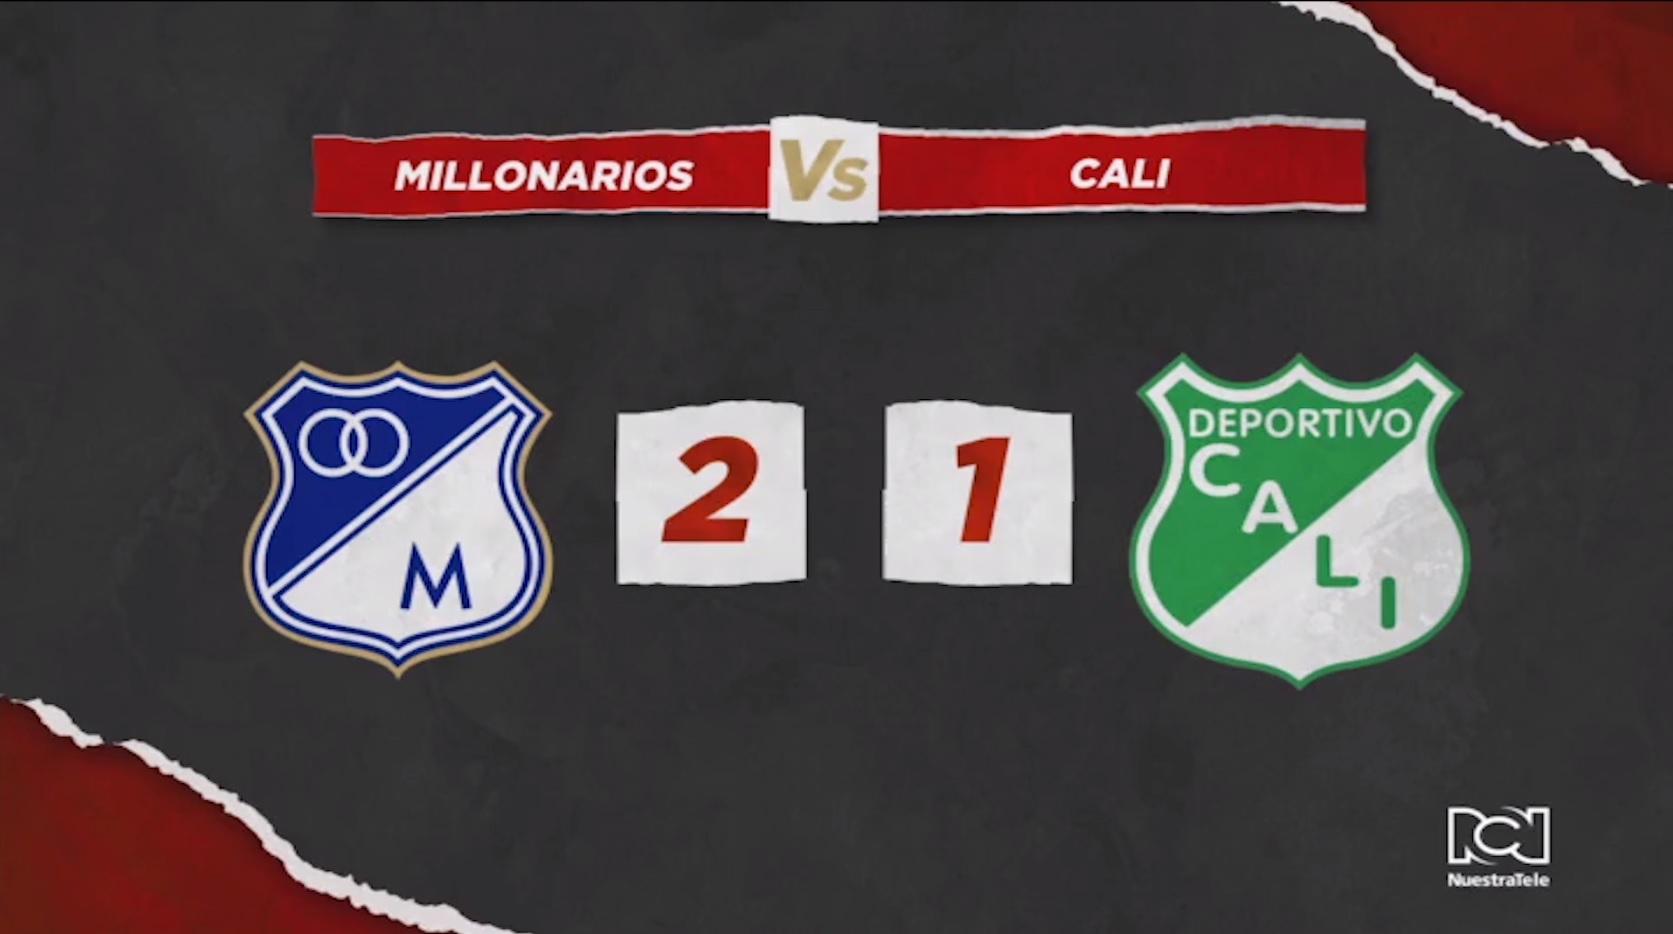 Millonarios Vs Deportivo Cali